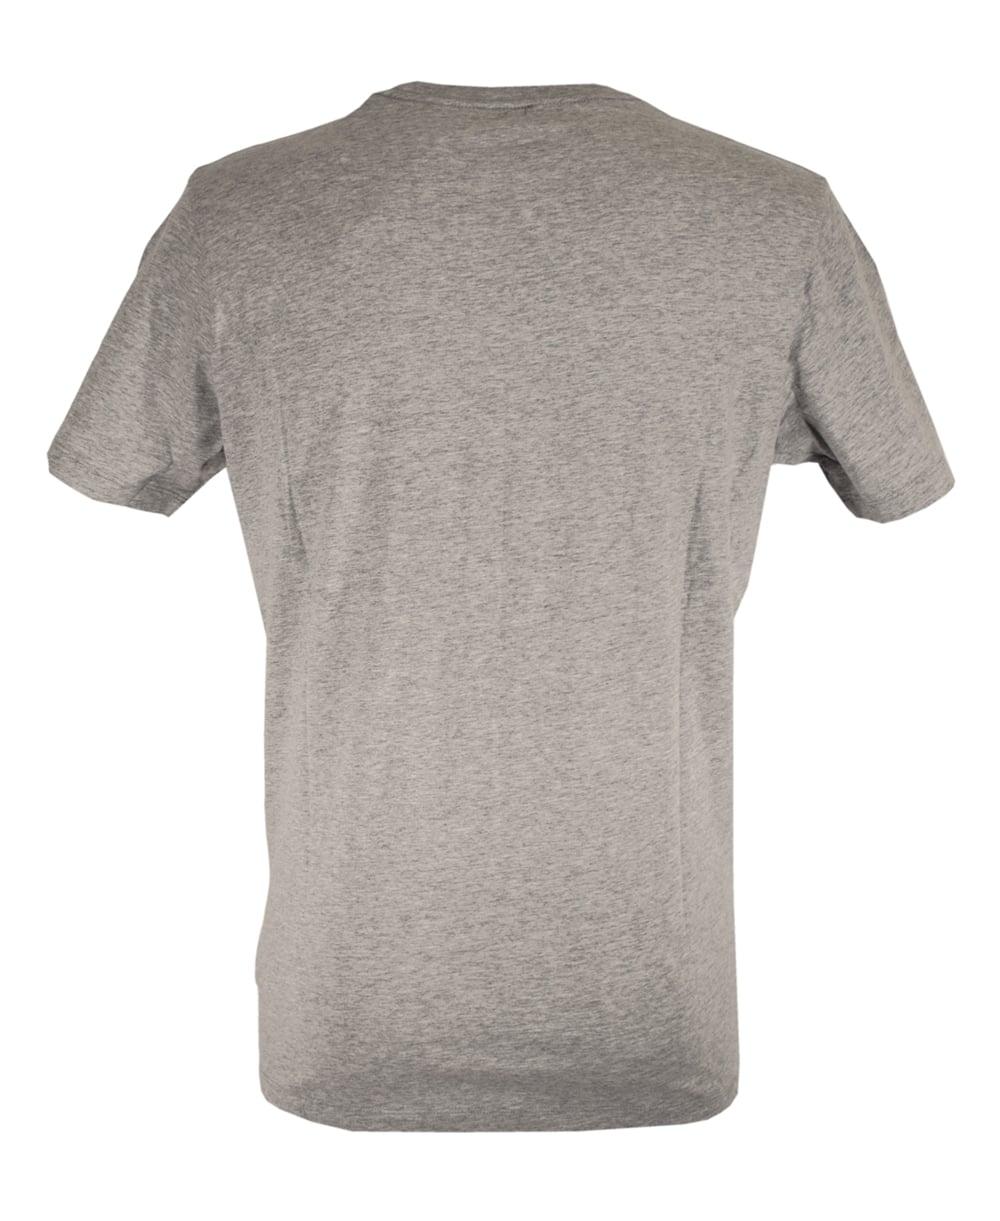 Grey T Joe Graphic Print T Shirt